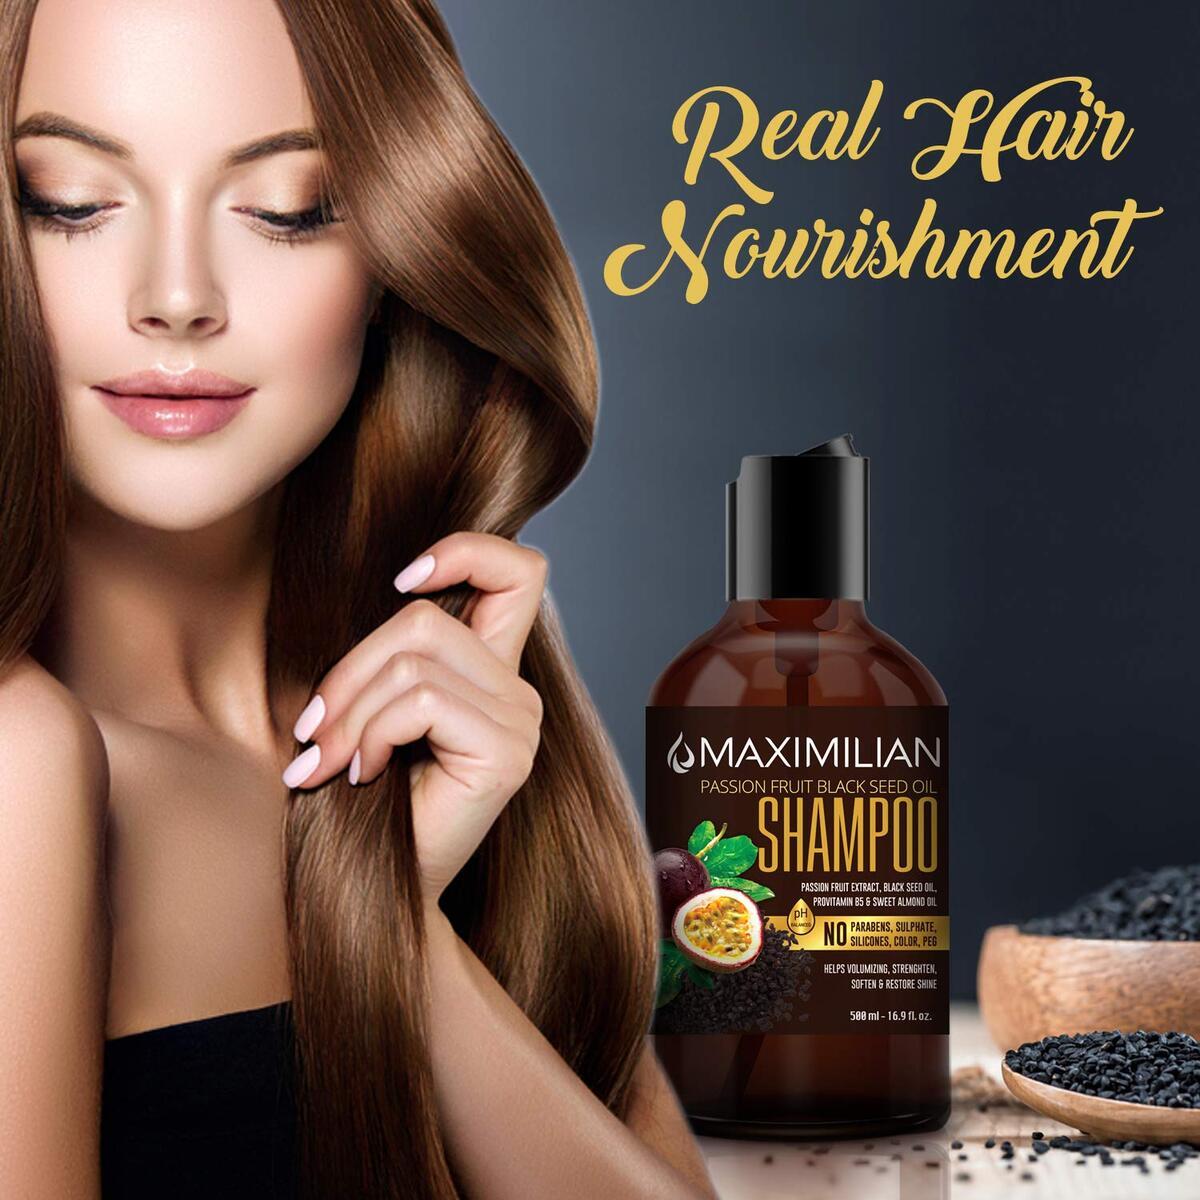 Maximilian Passion Fruit Black Seed Oil Curly Hair Shampoo and Conditioner Set- Extra Volumizing, Smoothing, Moisturizing, Soft and Shine - Sulfate Paraben Silicone Free -(2 x 16.9 Fl Oz / 500mL x 2)